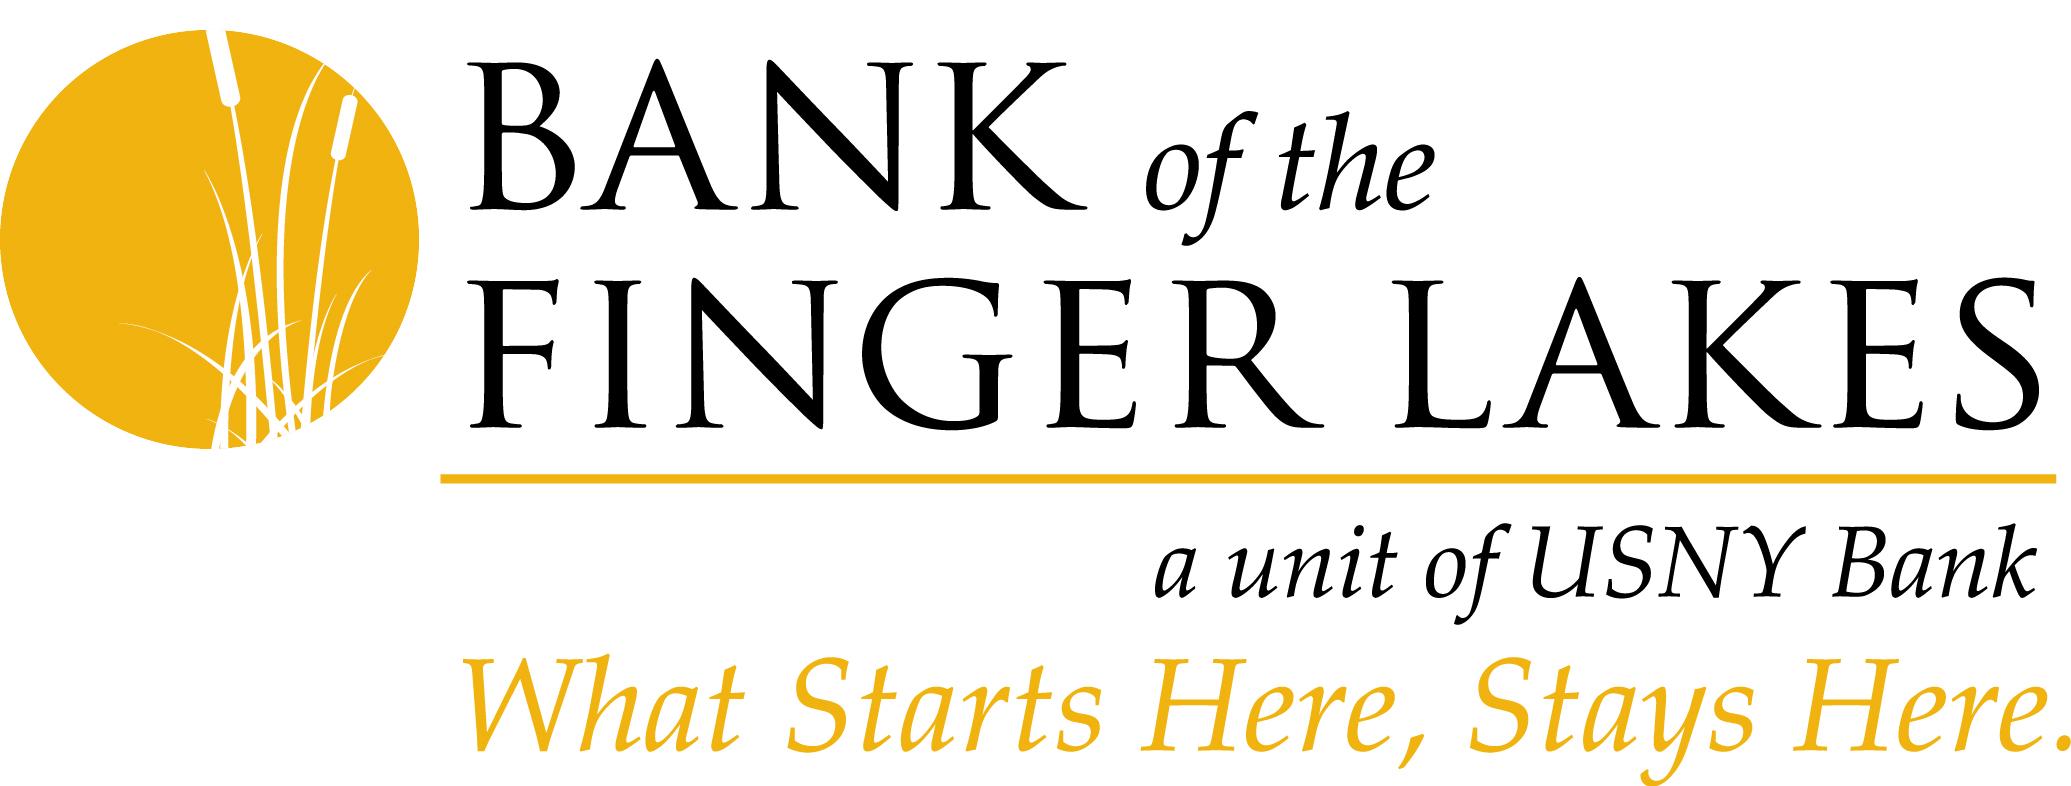 BankOfFingerlakes+tag - Copy.jpg